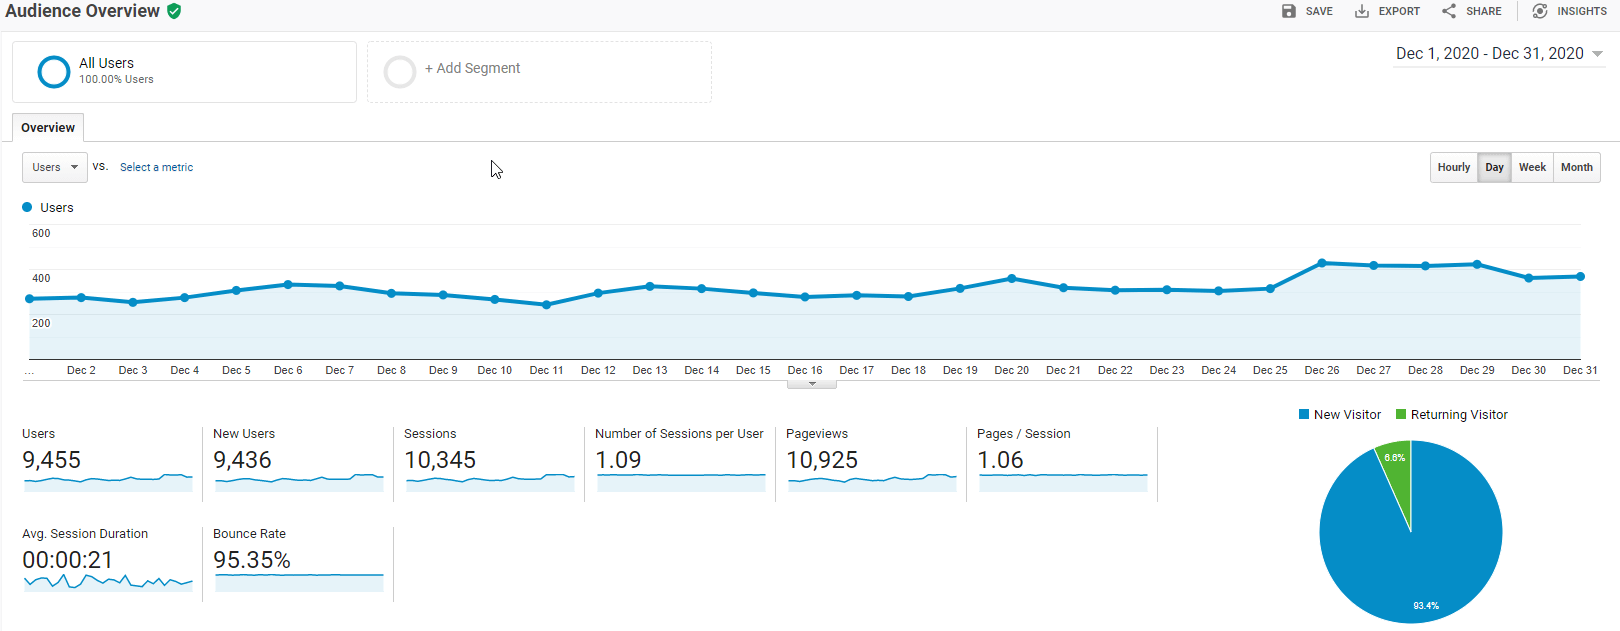 Google Analytics - Dec 2020